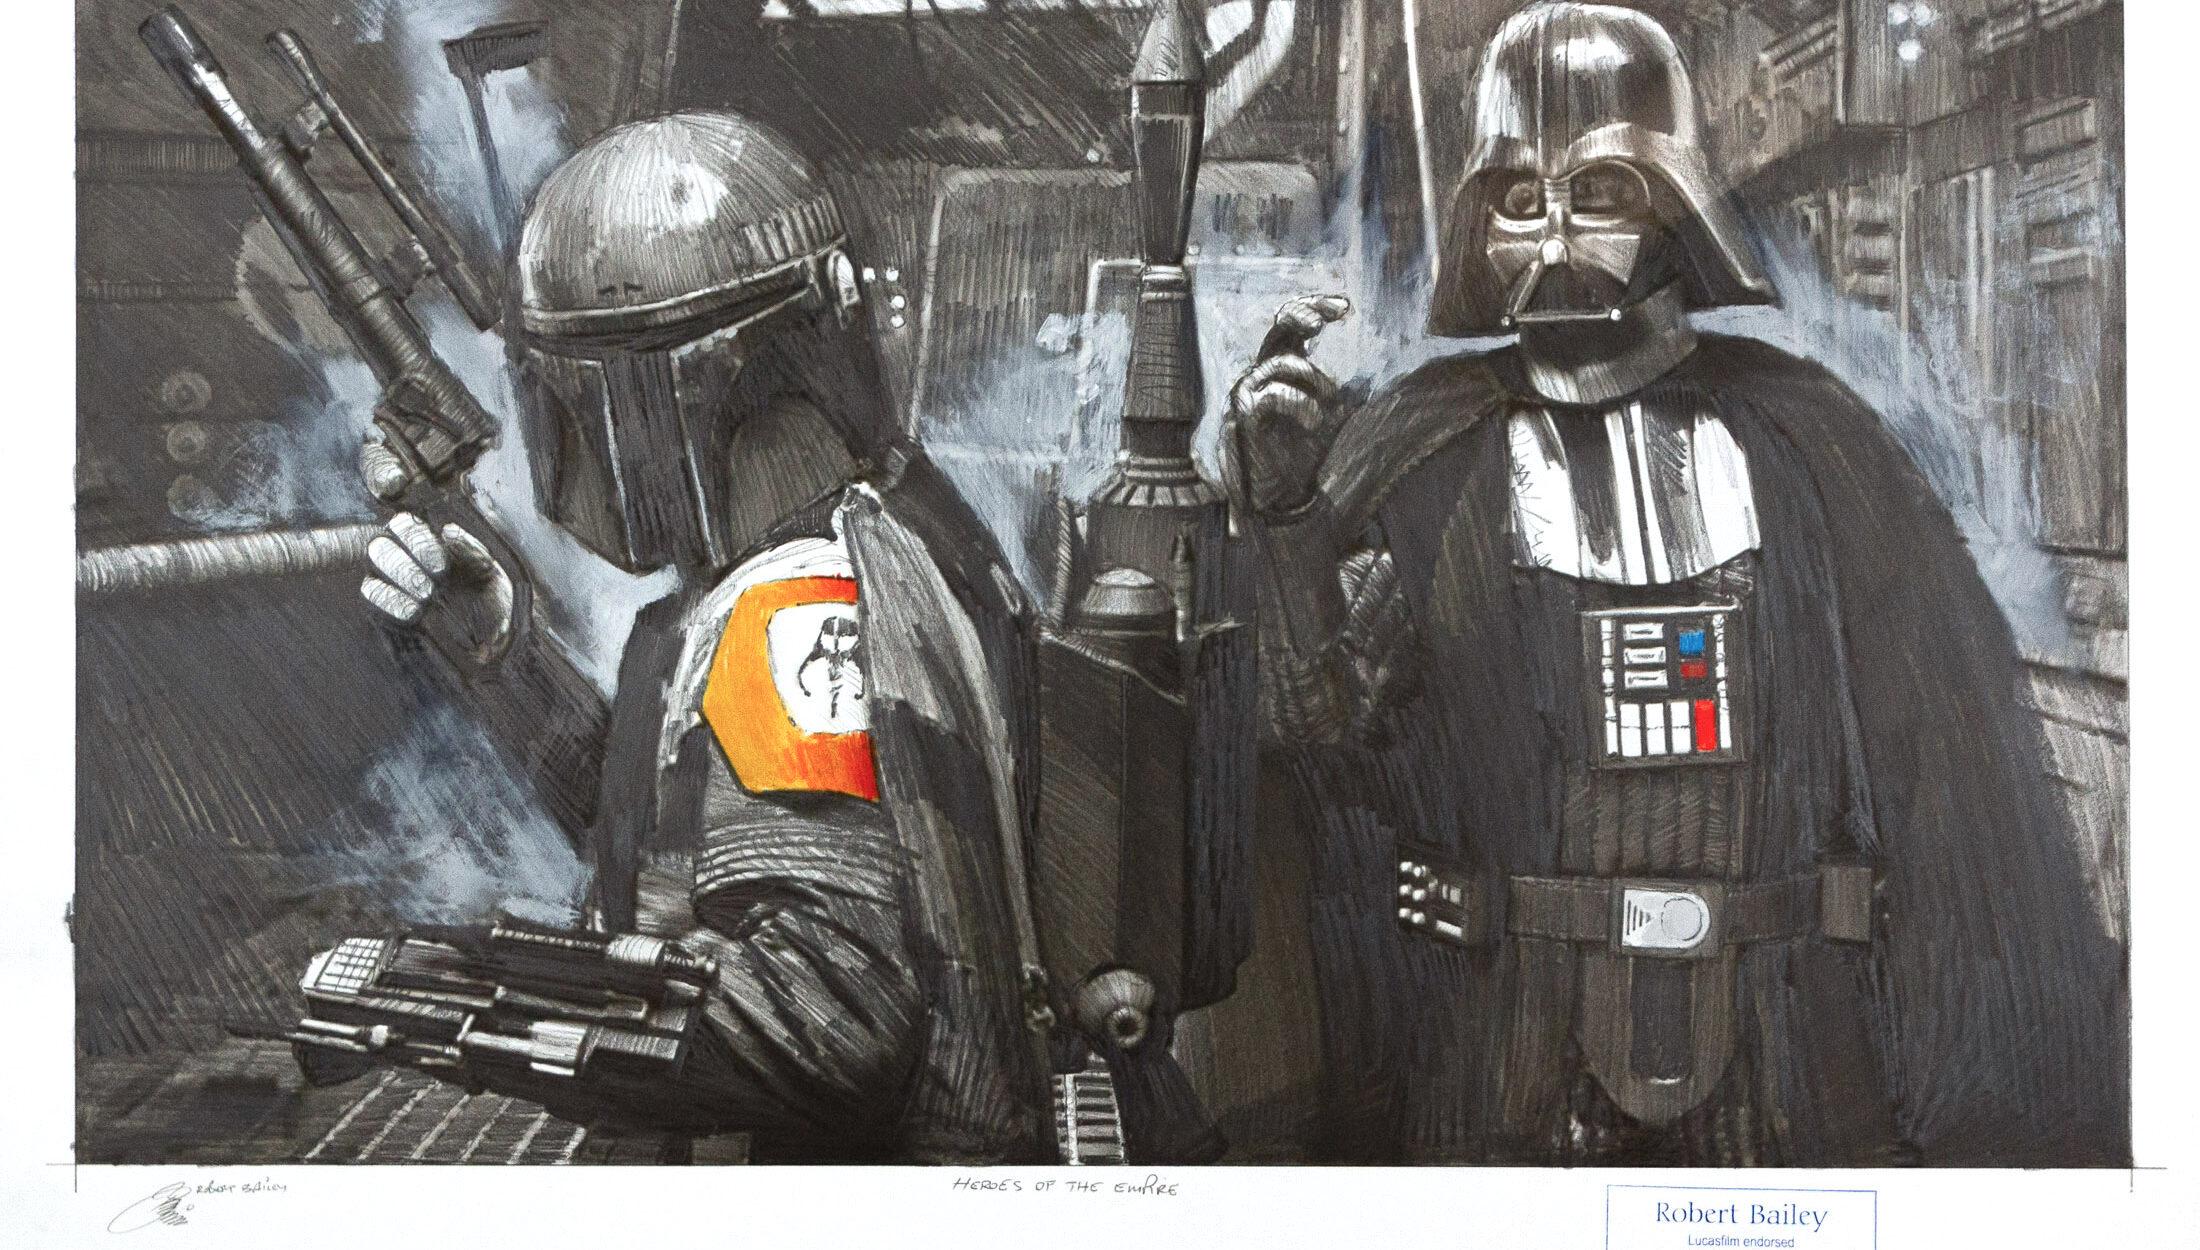 Robert Bailey: Heroes of the empire, Unikat, Bleistiftzeichnung, 75 x 56 cm, 2.940 Eur